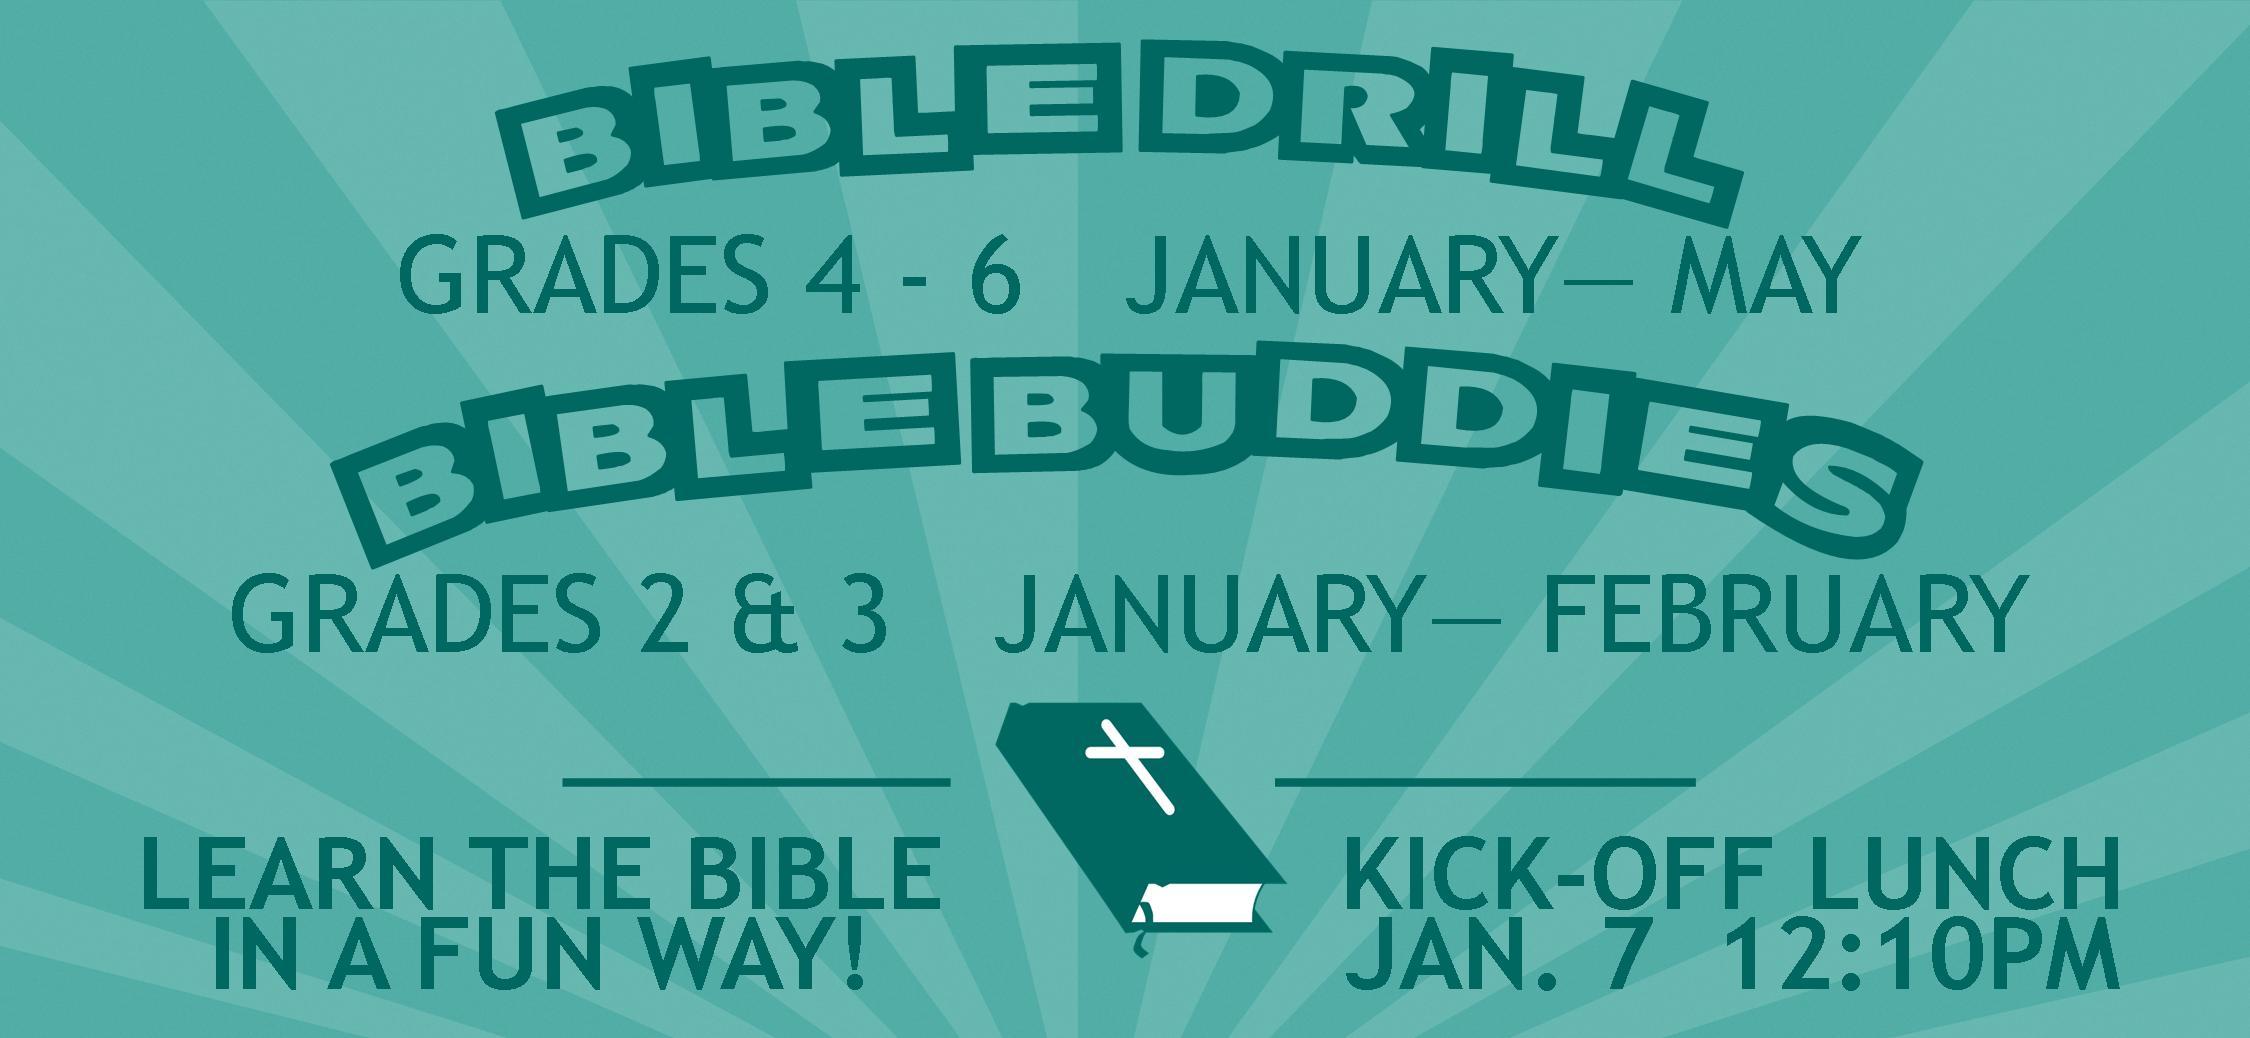 Bible Drill Bible Buddies 122817.jpg